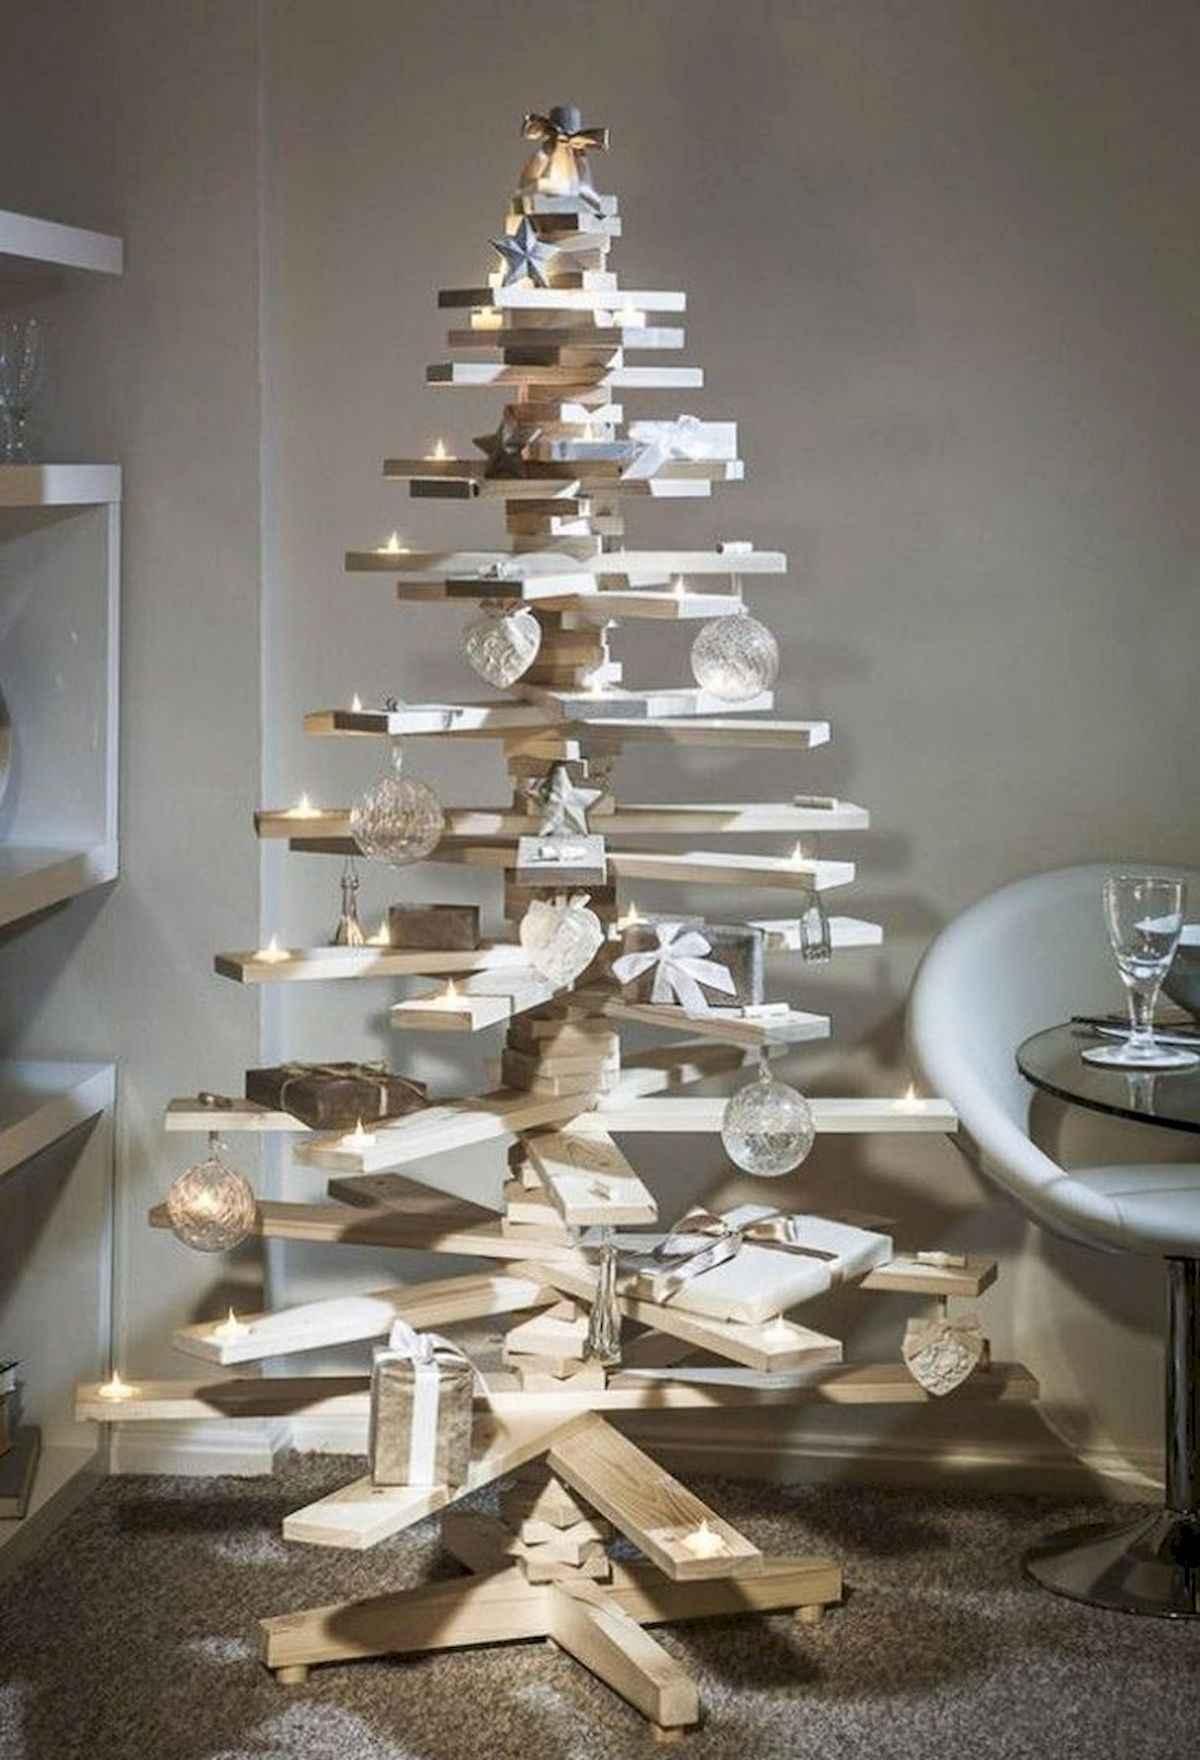 50 diy christmas decorations ideas (39)